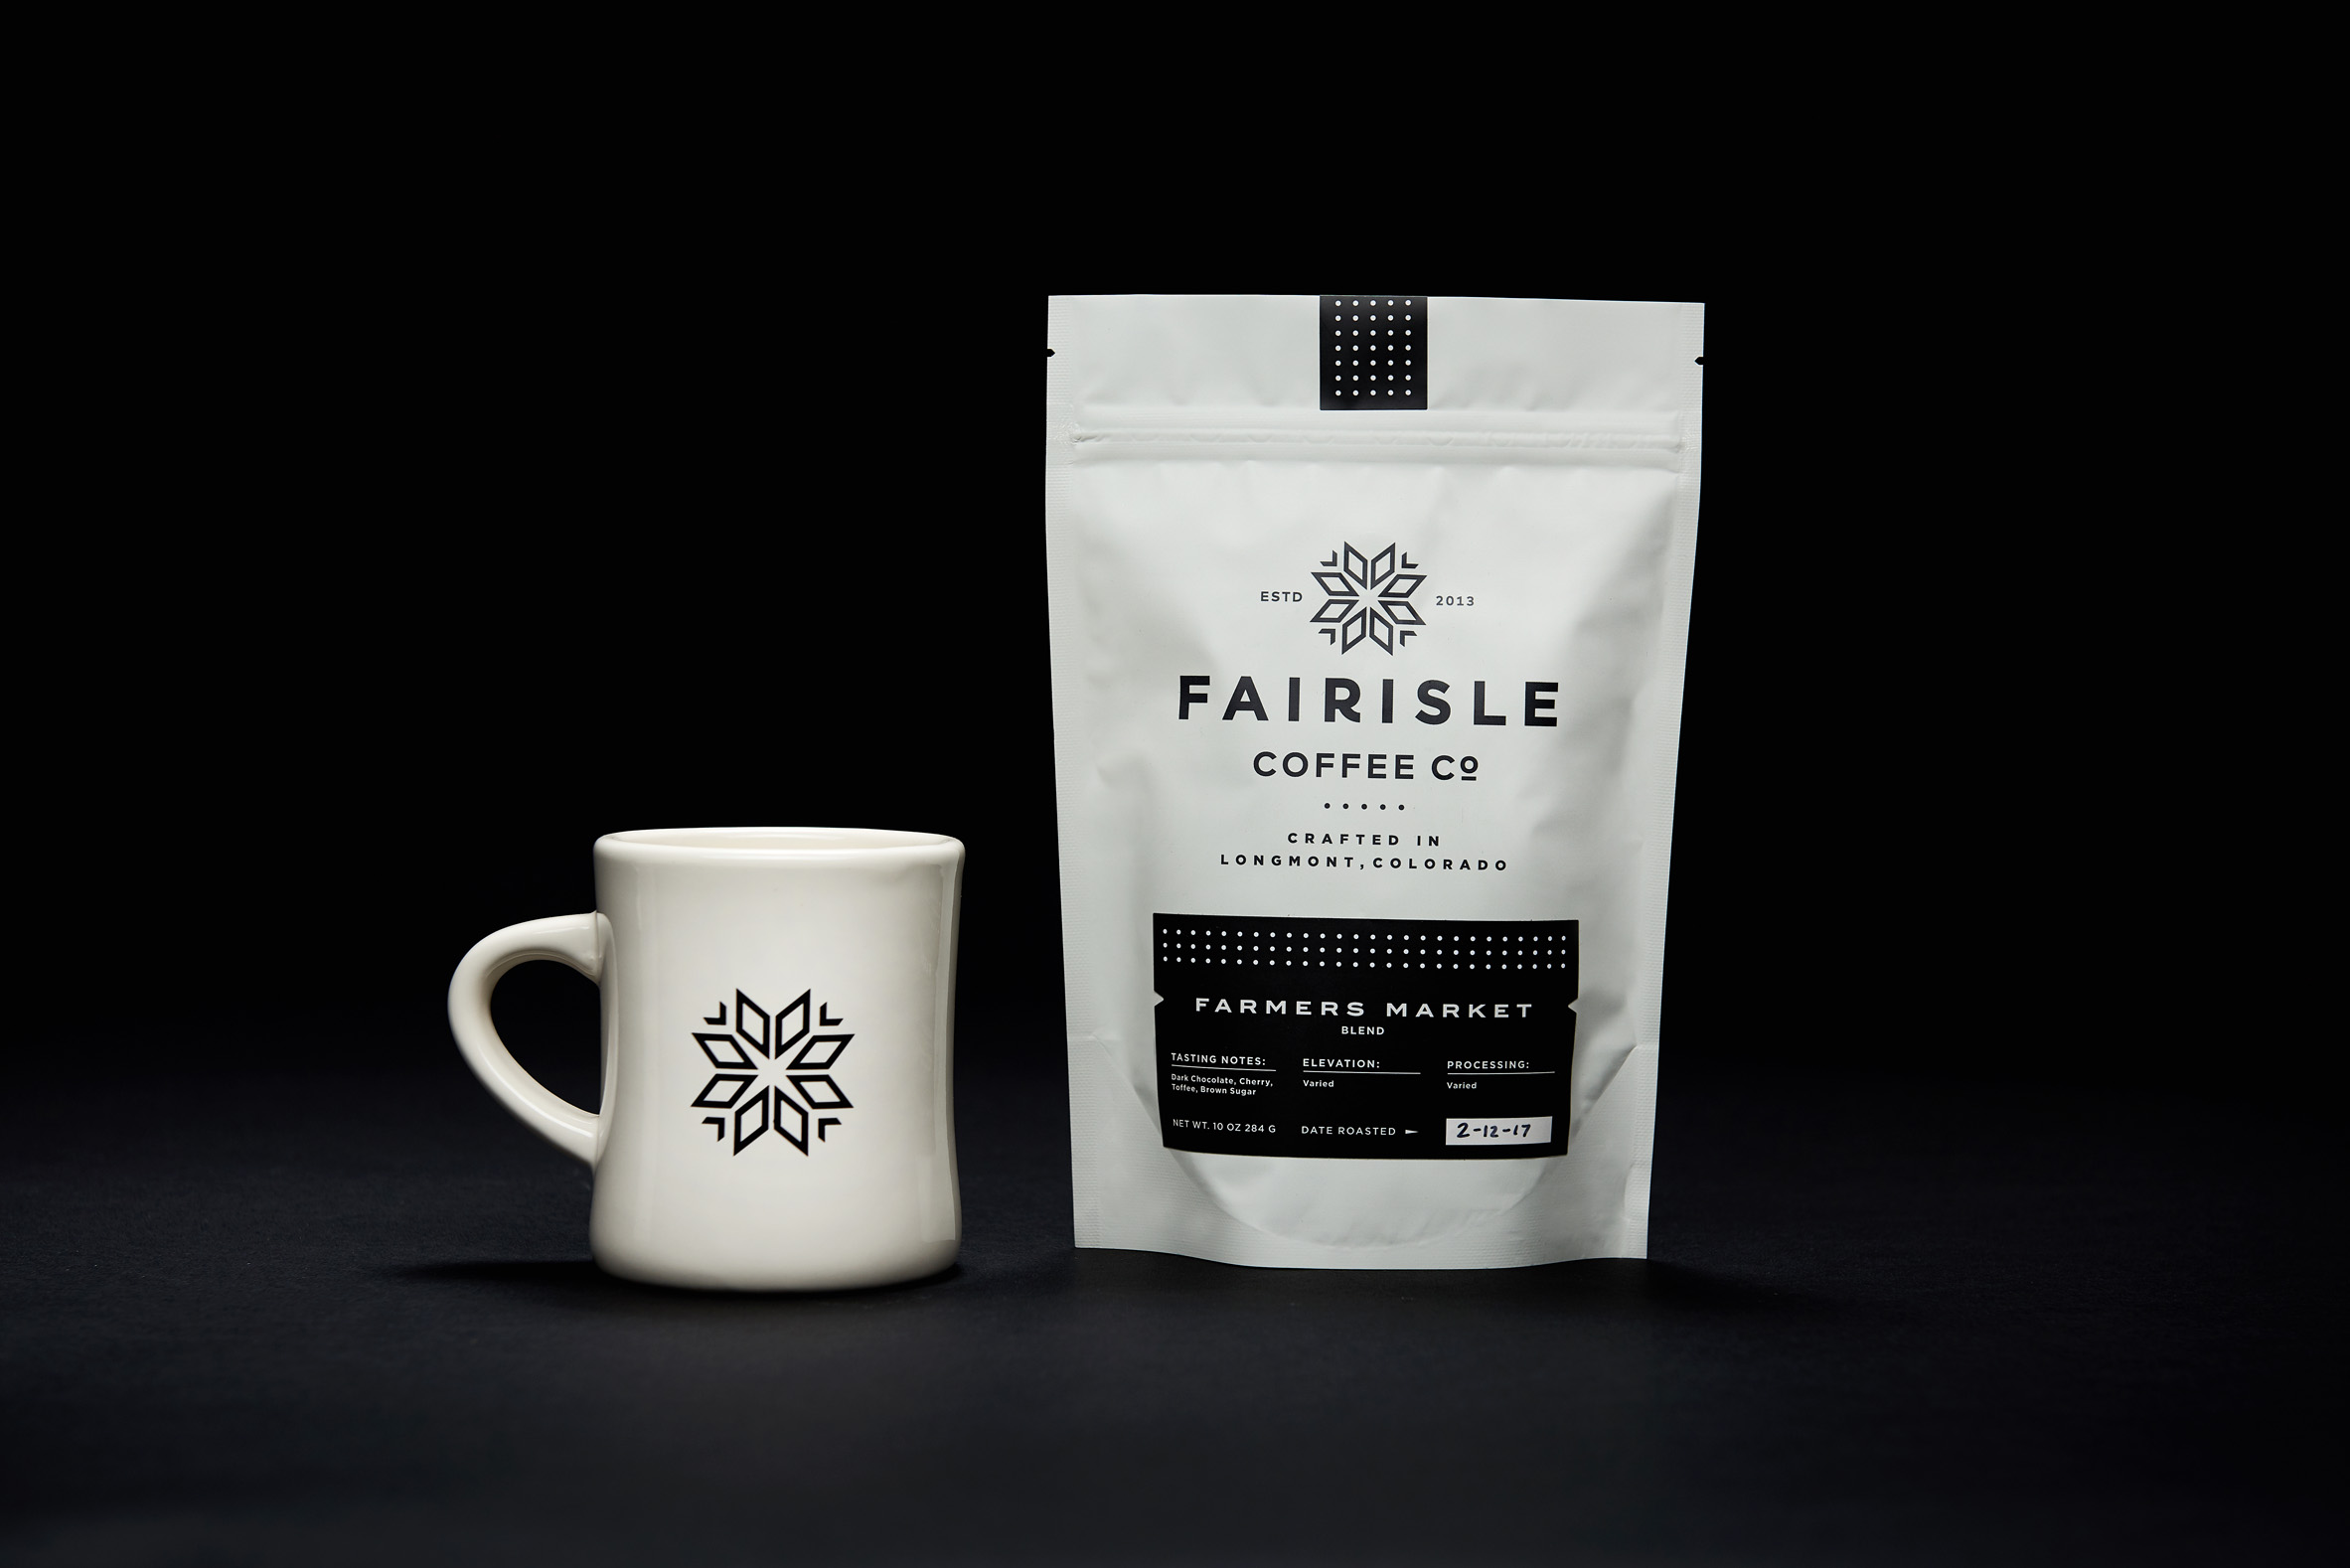 Fairisle Coffee